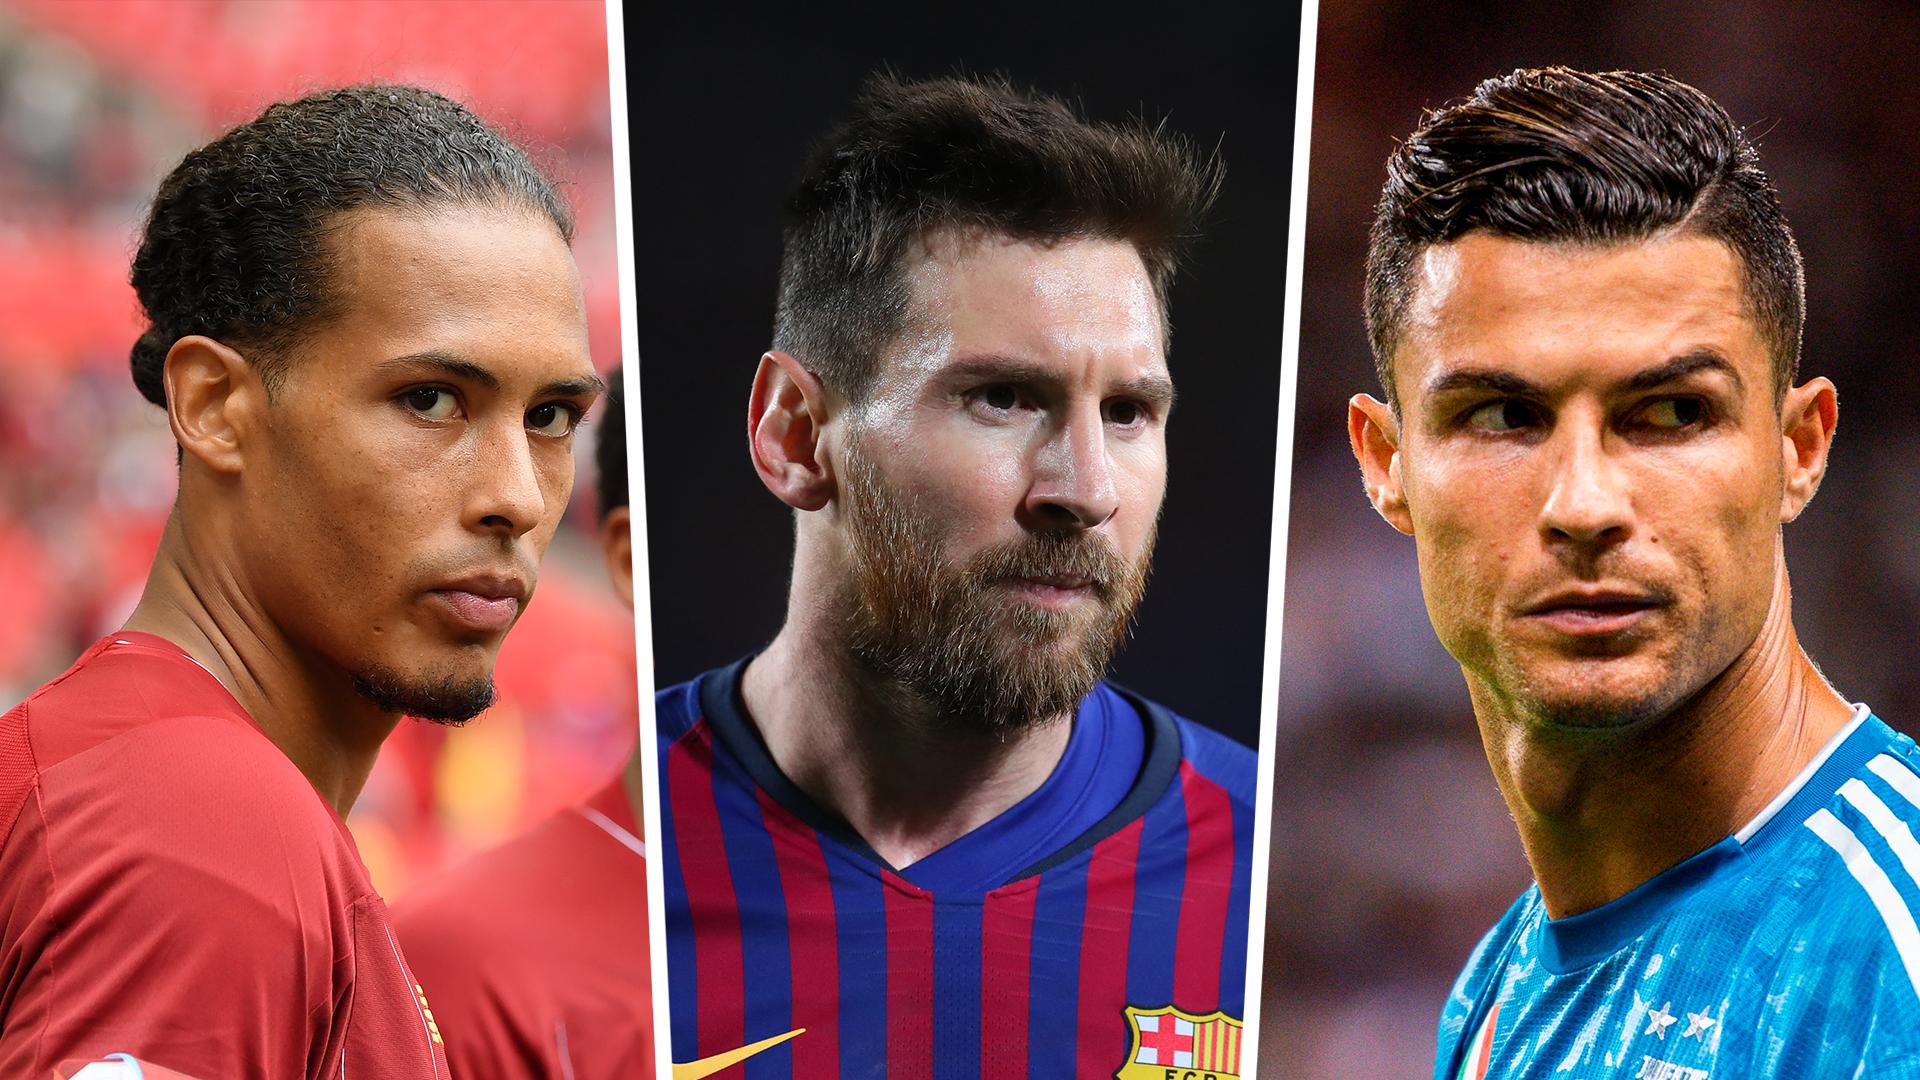 Van Dijk, Messi & Ronaldo up for UEFA Player of the Year